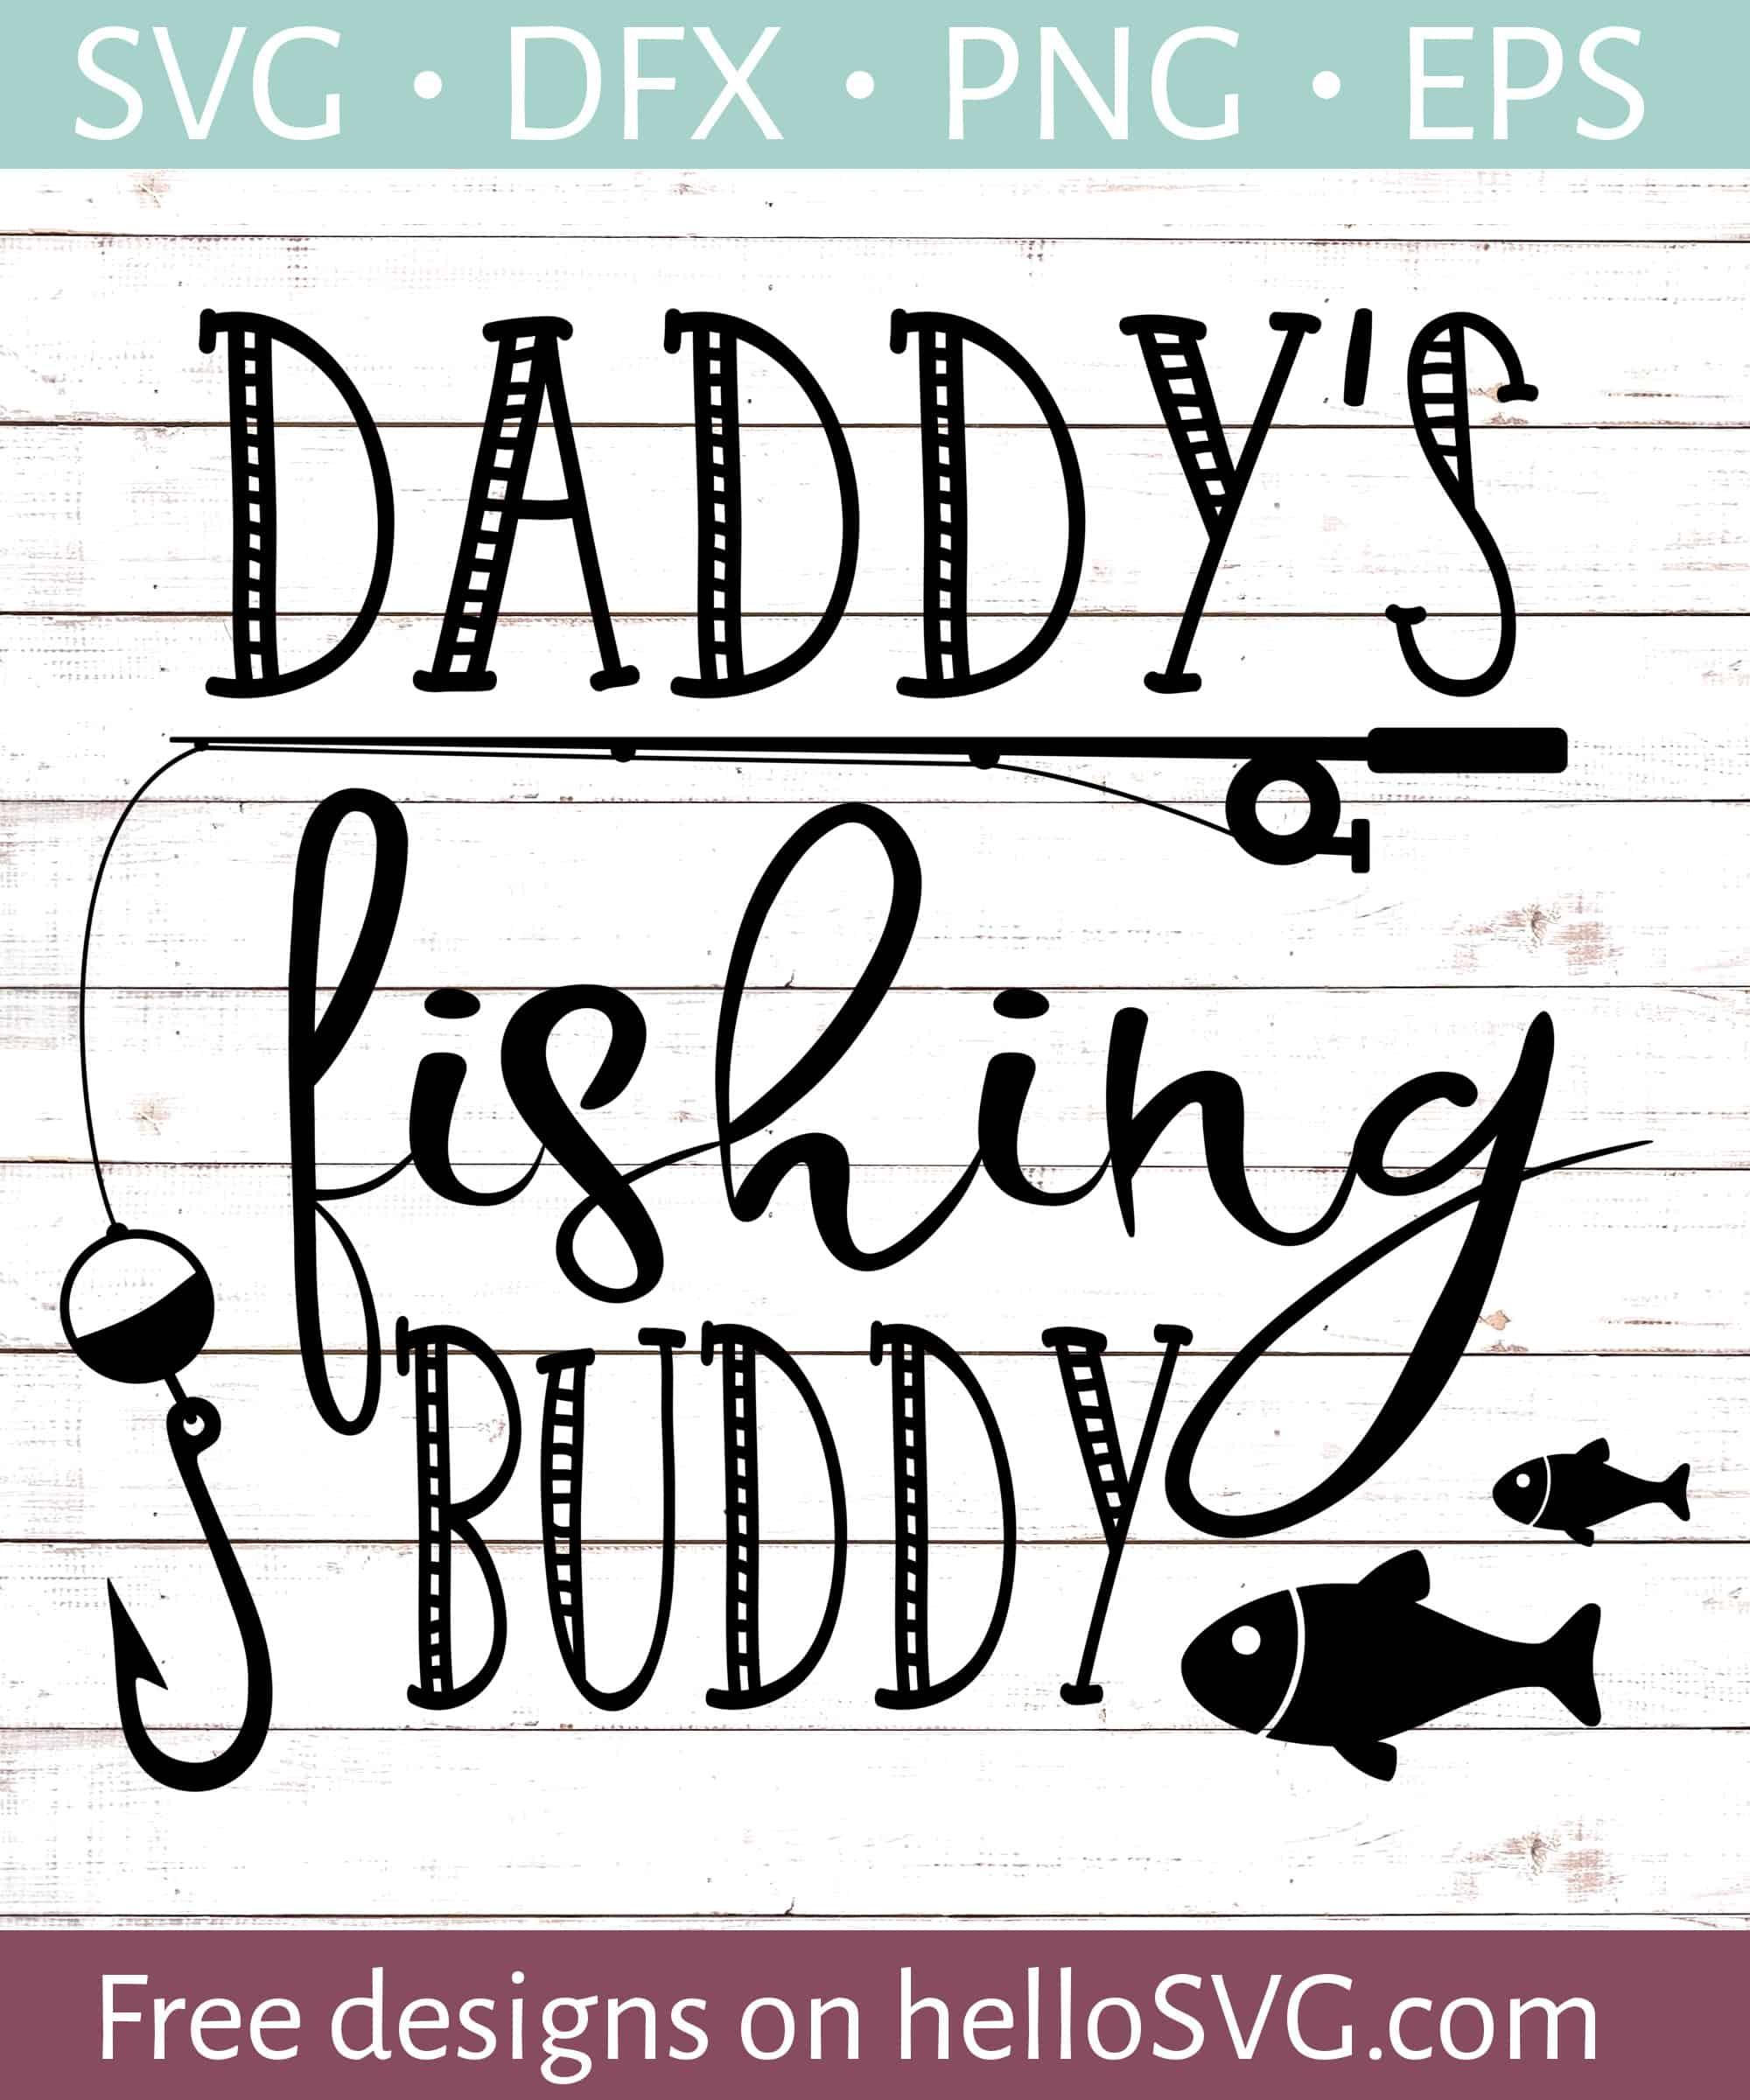 fc4242aa4 Daddy's Fishing Buddy #1 SVG - Free SVG files | HelloSVG.com